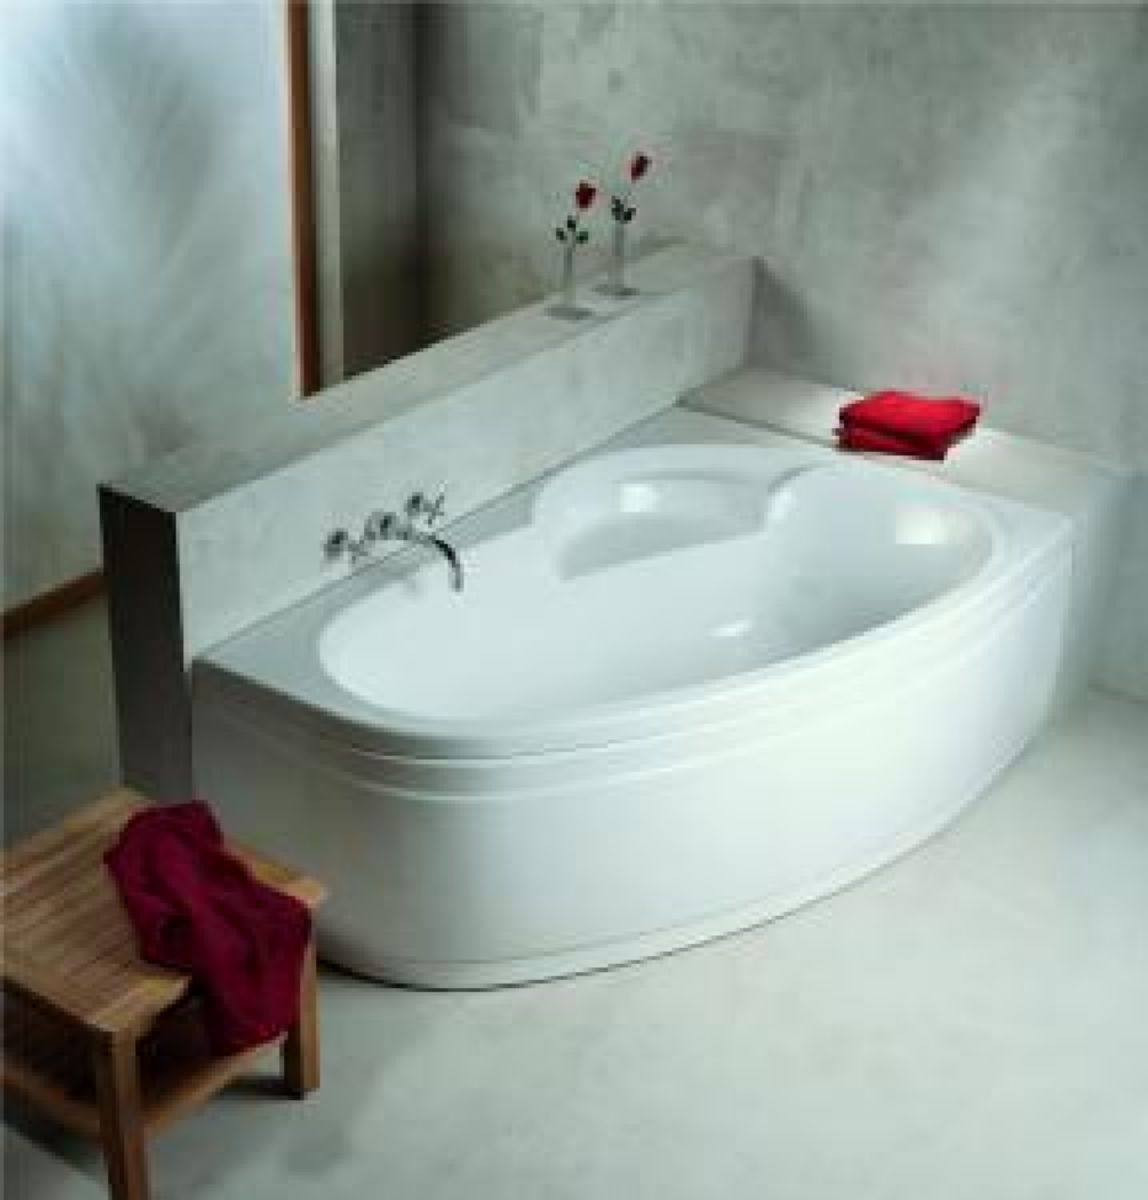 baignoire asymetrique ladiva junior 160x100 cm gauche avec tablier vidage standard non fourni